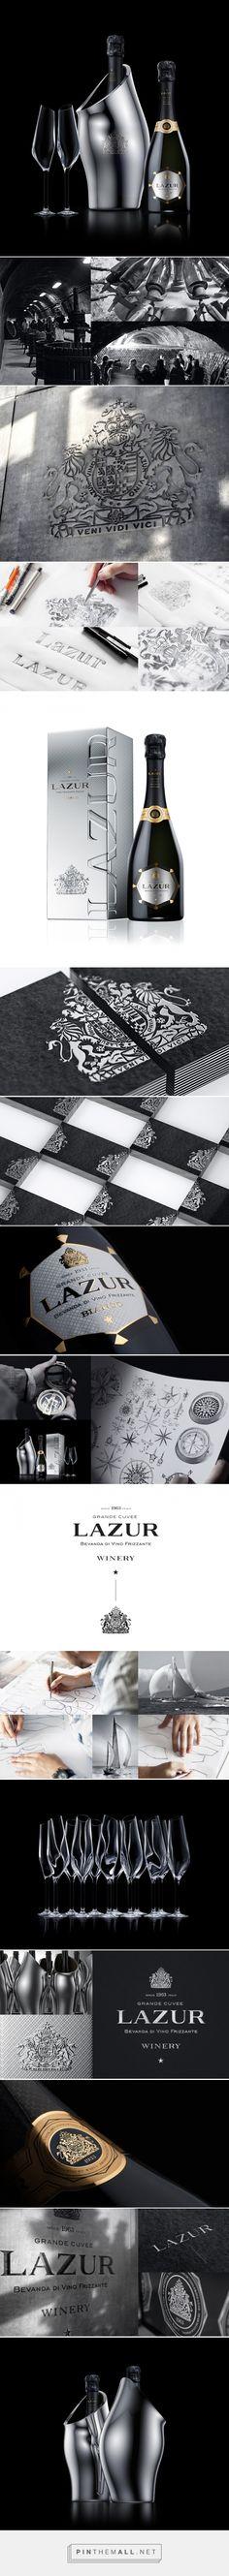 Lazur wine packaging designed by Reynolds and Reyner - http://www.packagingoftheworld.com/2015/12/lazur.html